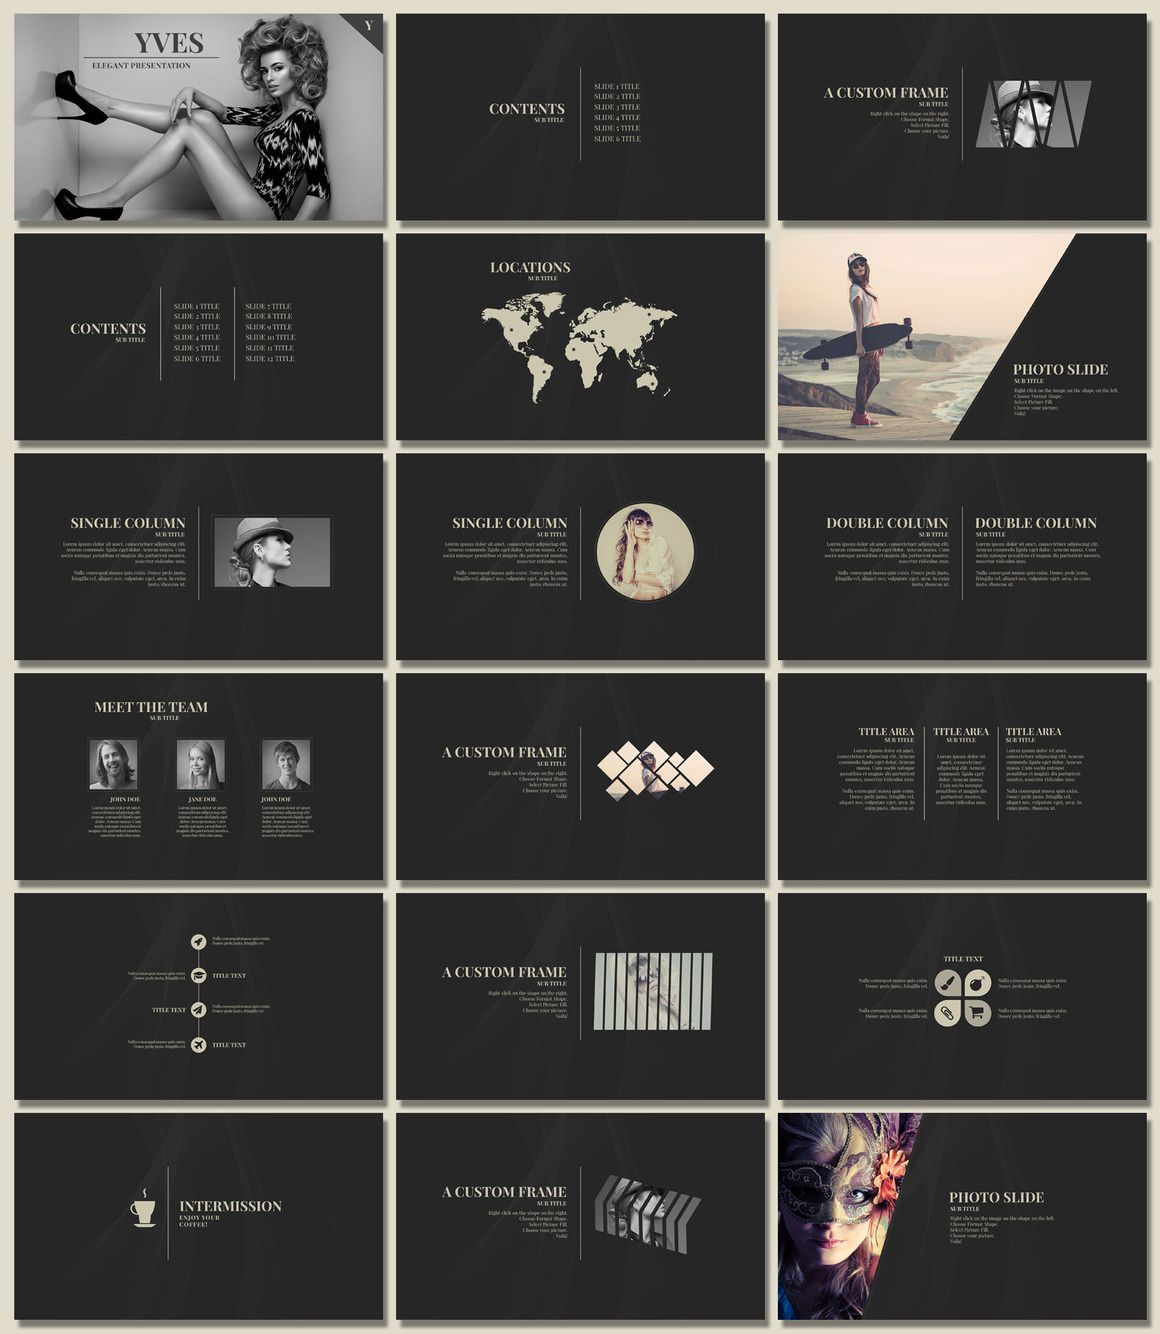 Yves Elegant Presentation Pinterest Fashion Templates - Luxury simple ppt template scheme